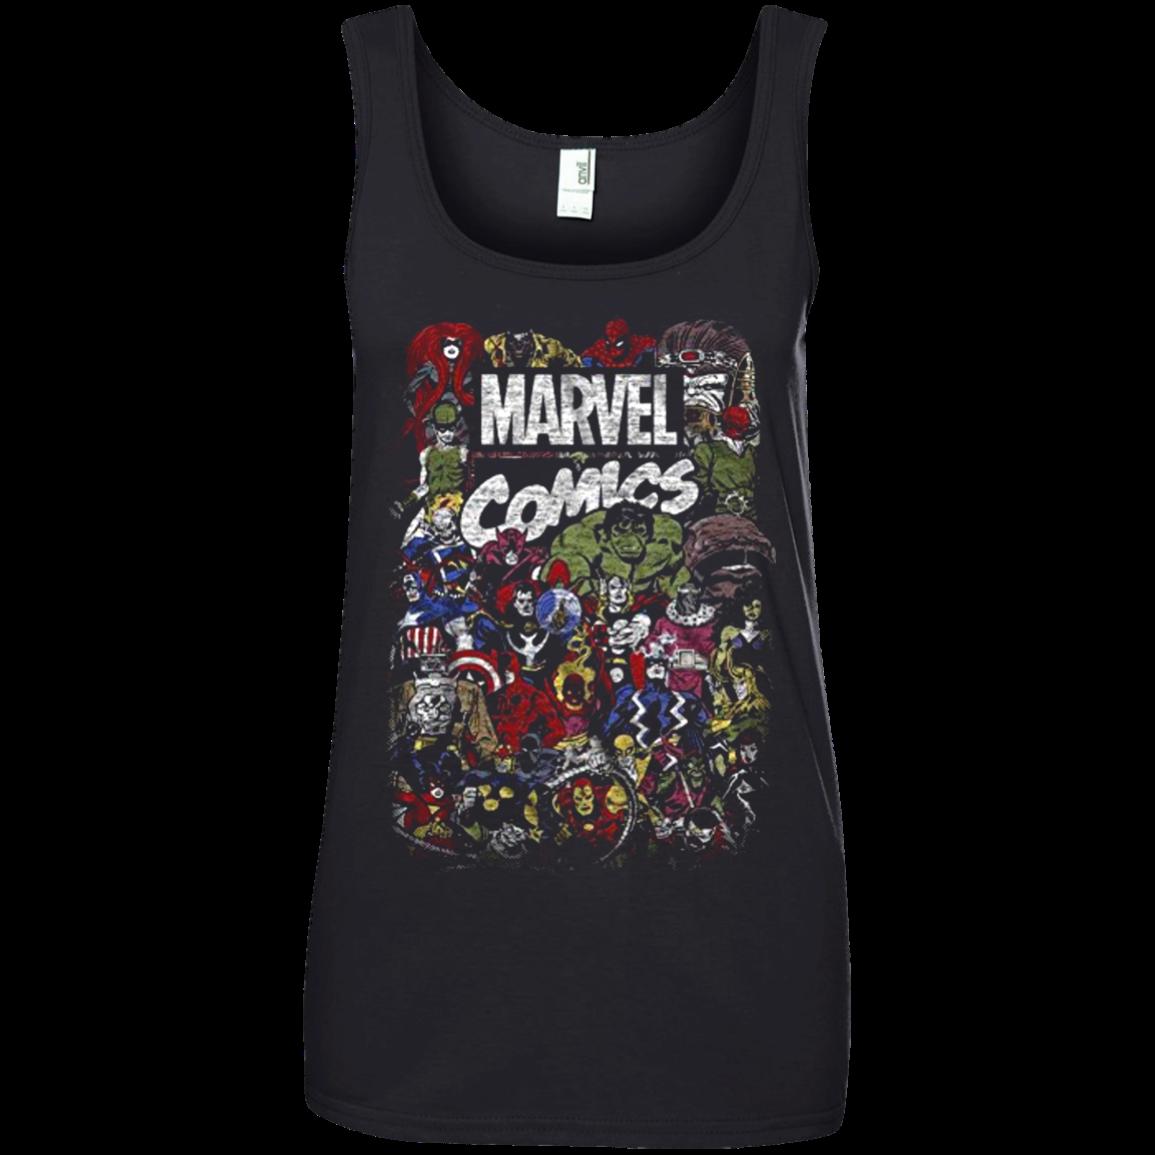 Comics Logo Thor Hulk Iron Man Avengers Spiderman Daredevil Strange Loki Thanos T shirt hoodie sweater Tank Top 882